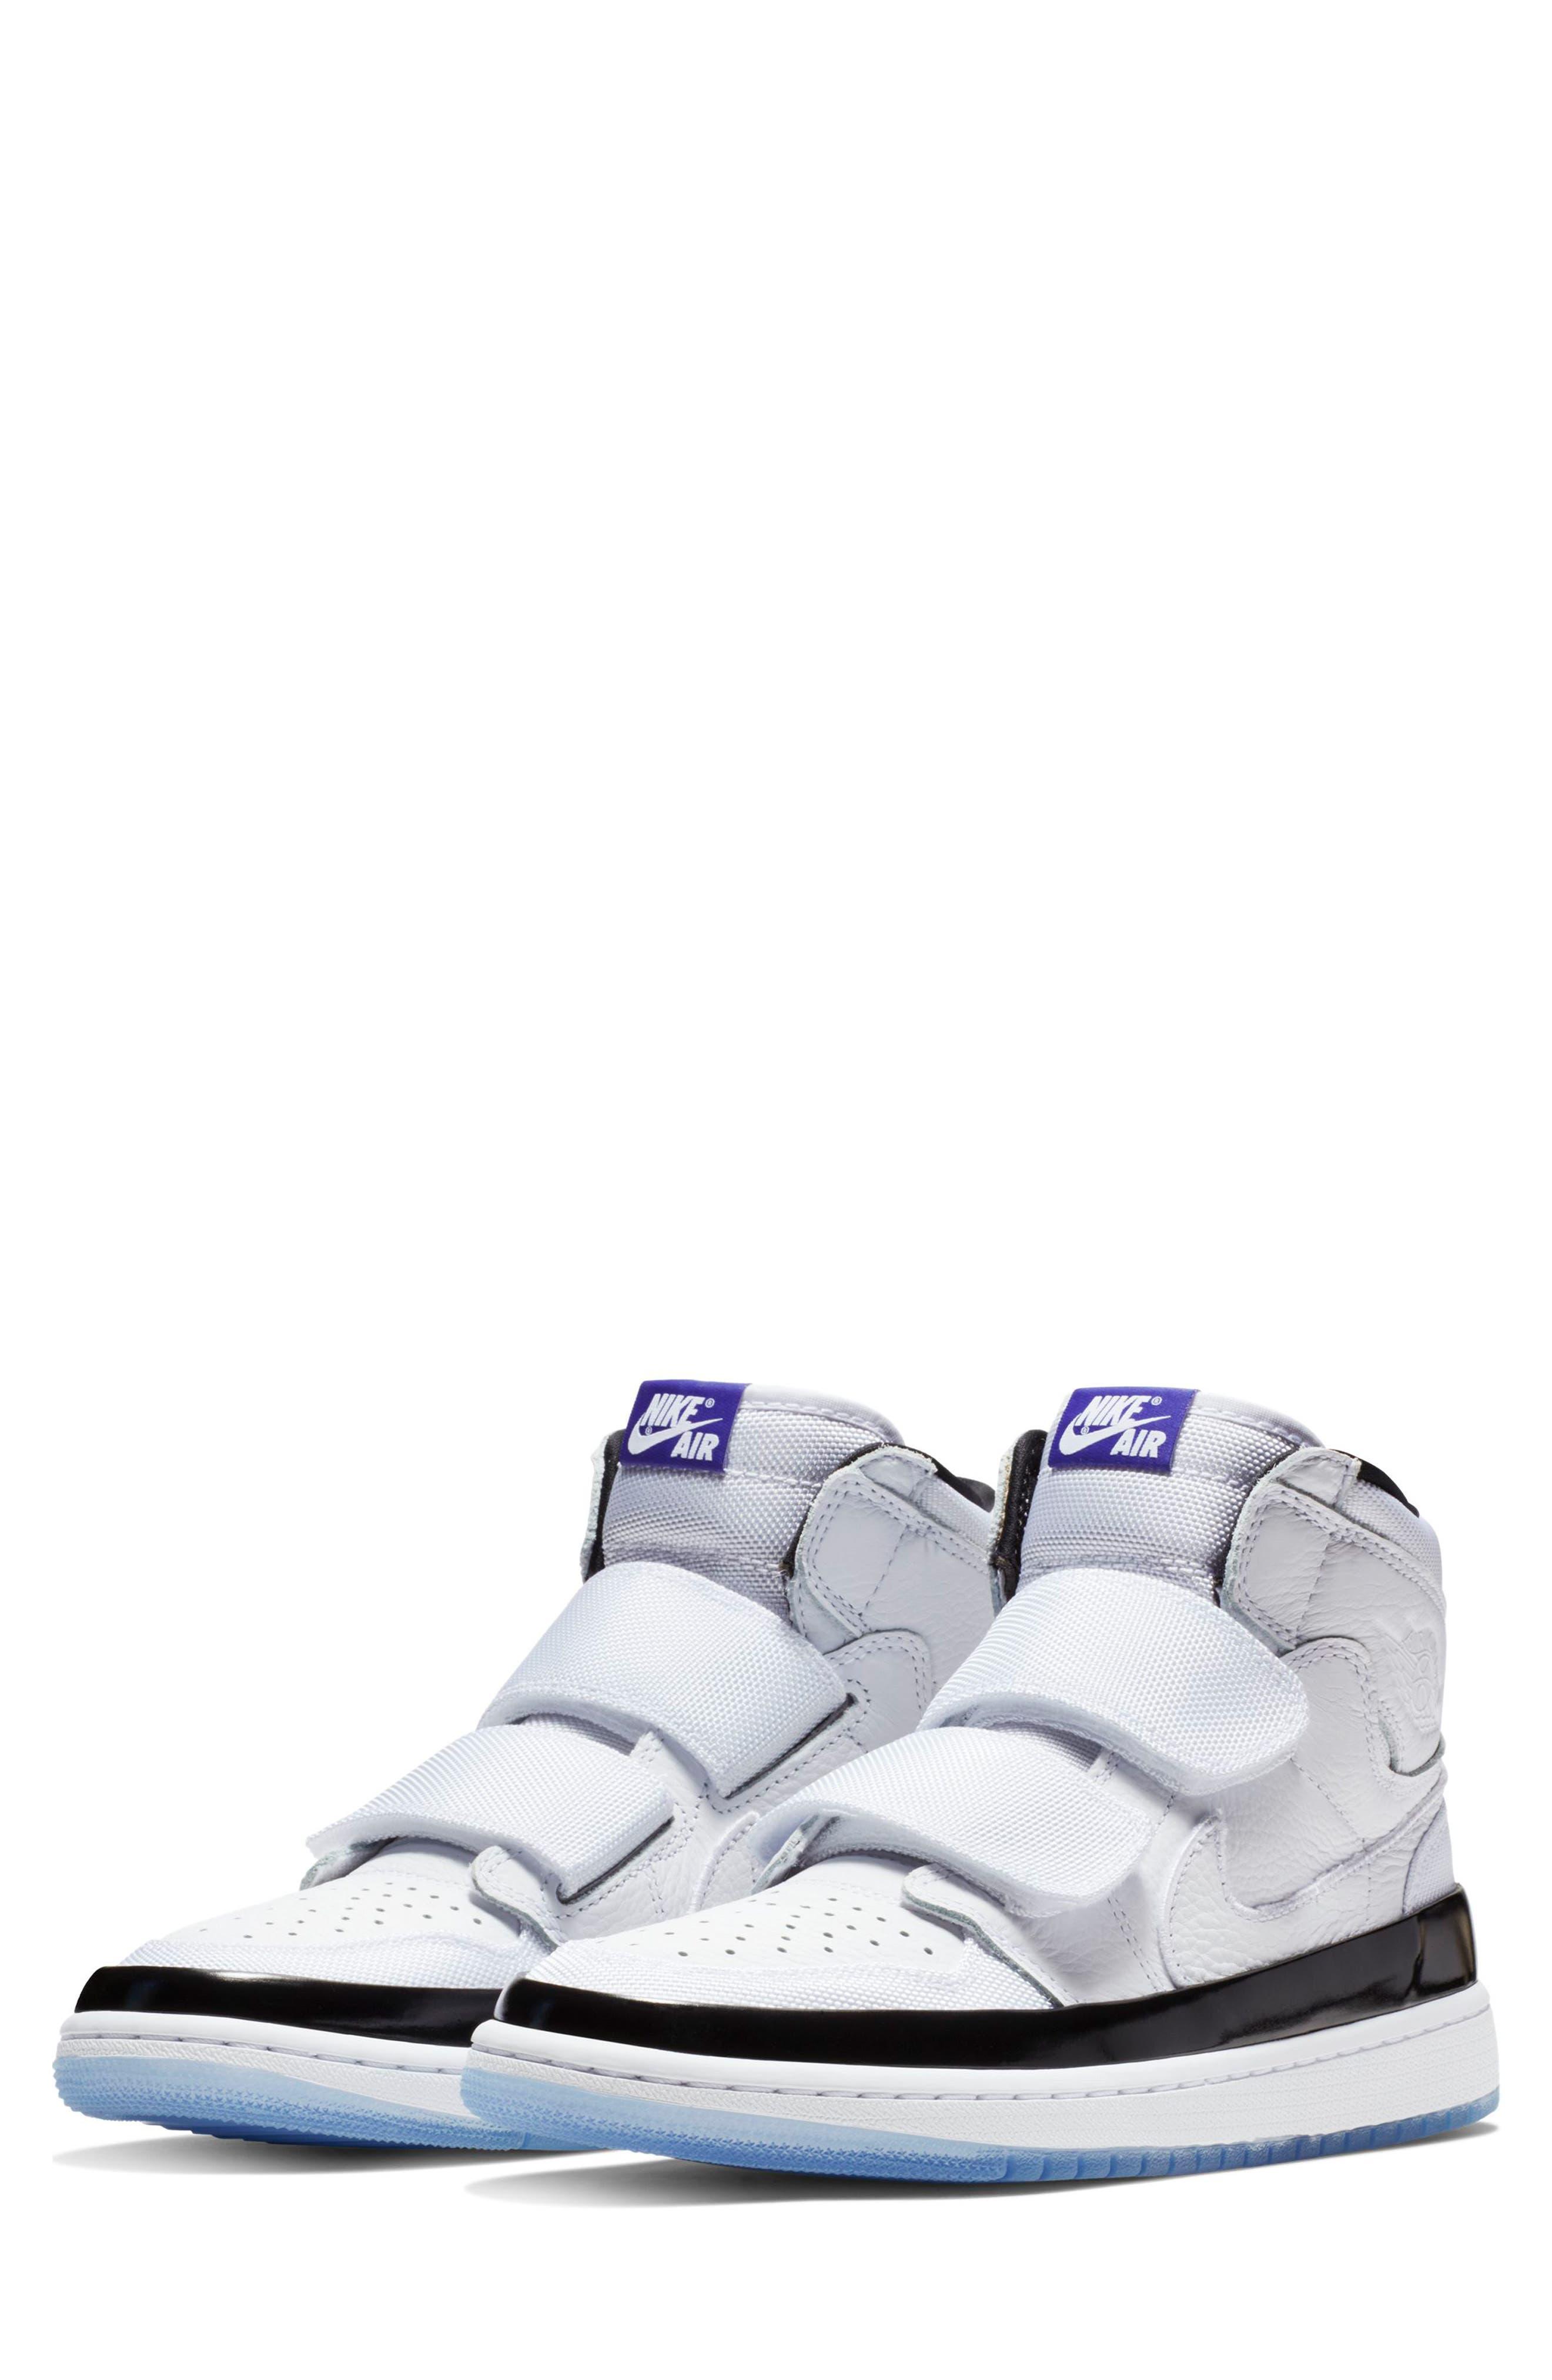 NIKE, Air Jordan 1 Retro High Double Strap Sneaker, Main thumbnail 1, color, WHITE/ DARK CONCORD/ BLACK